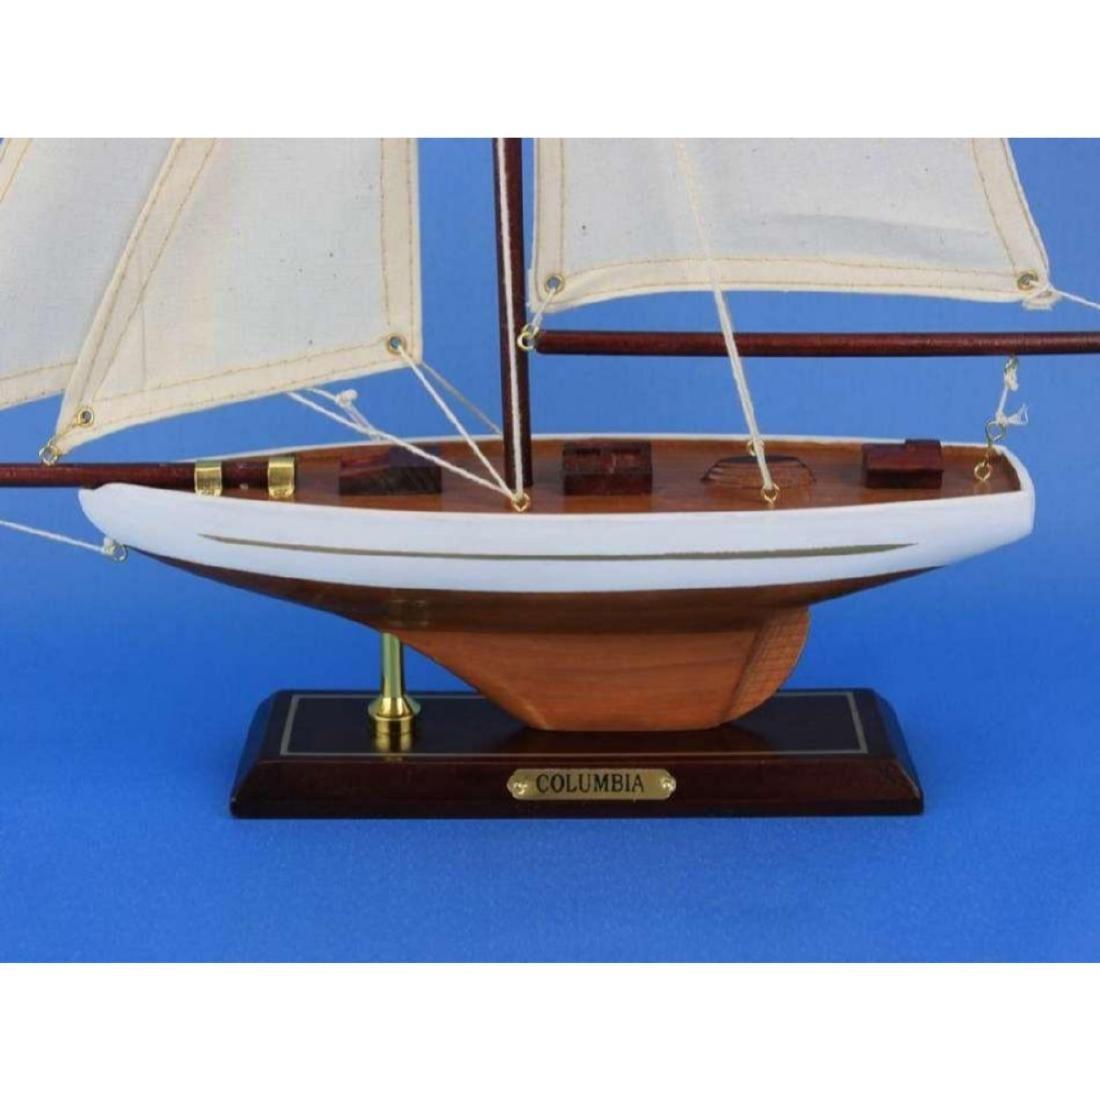 "Wooden Columbia Model Sailboat Decoration 16"" - 5"